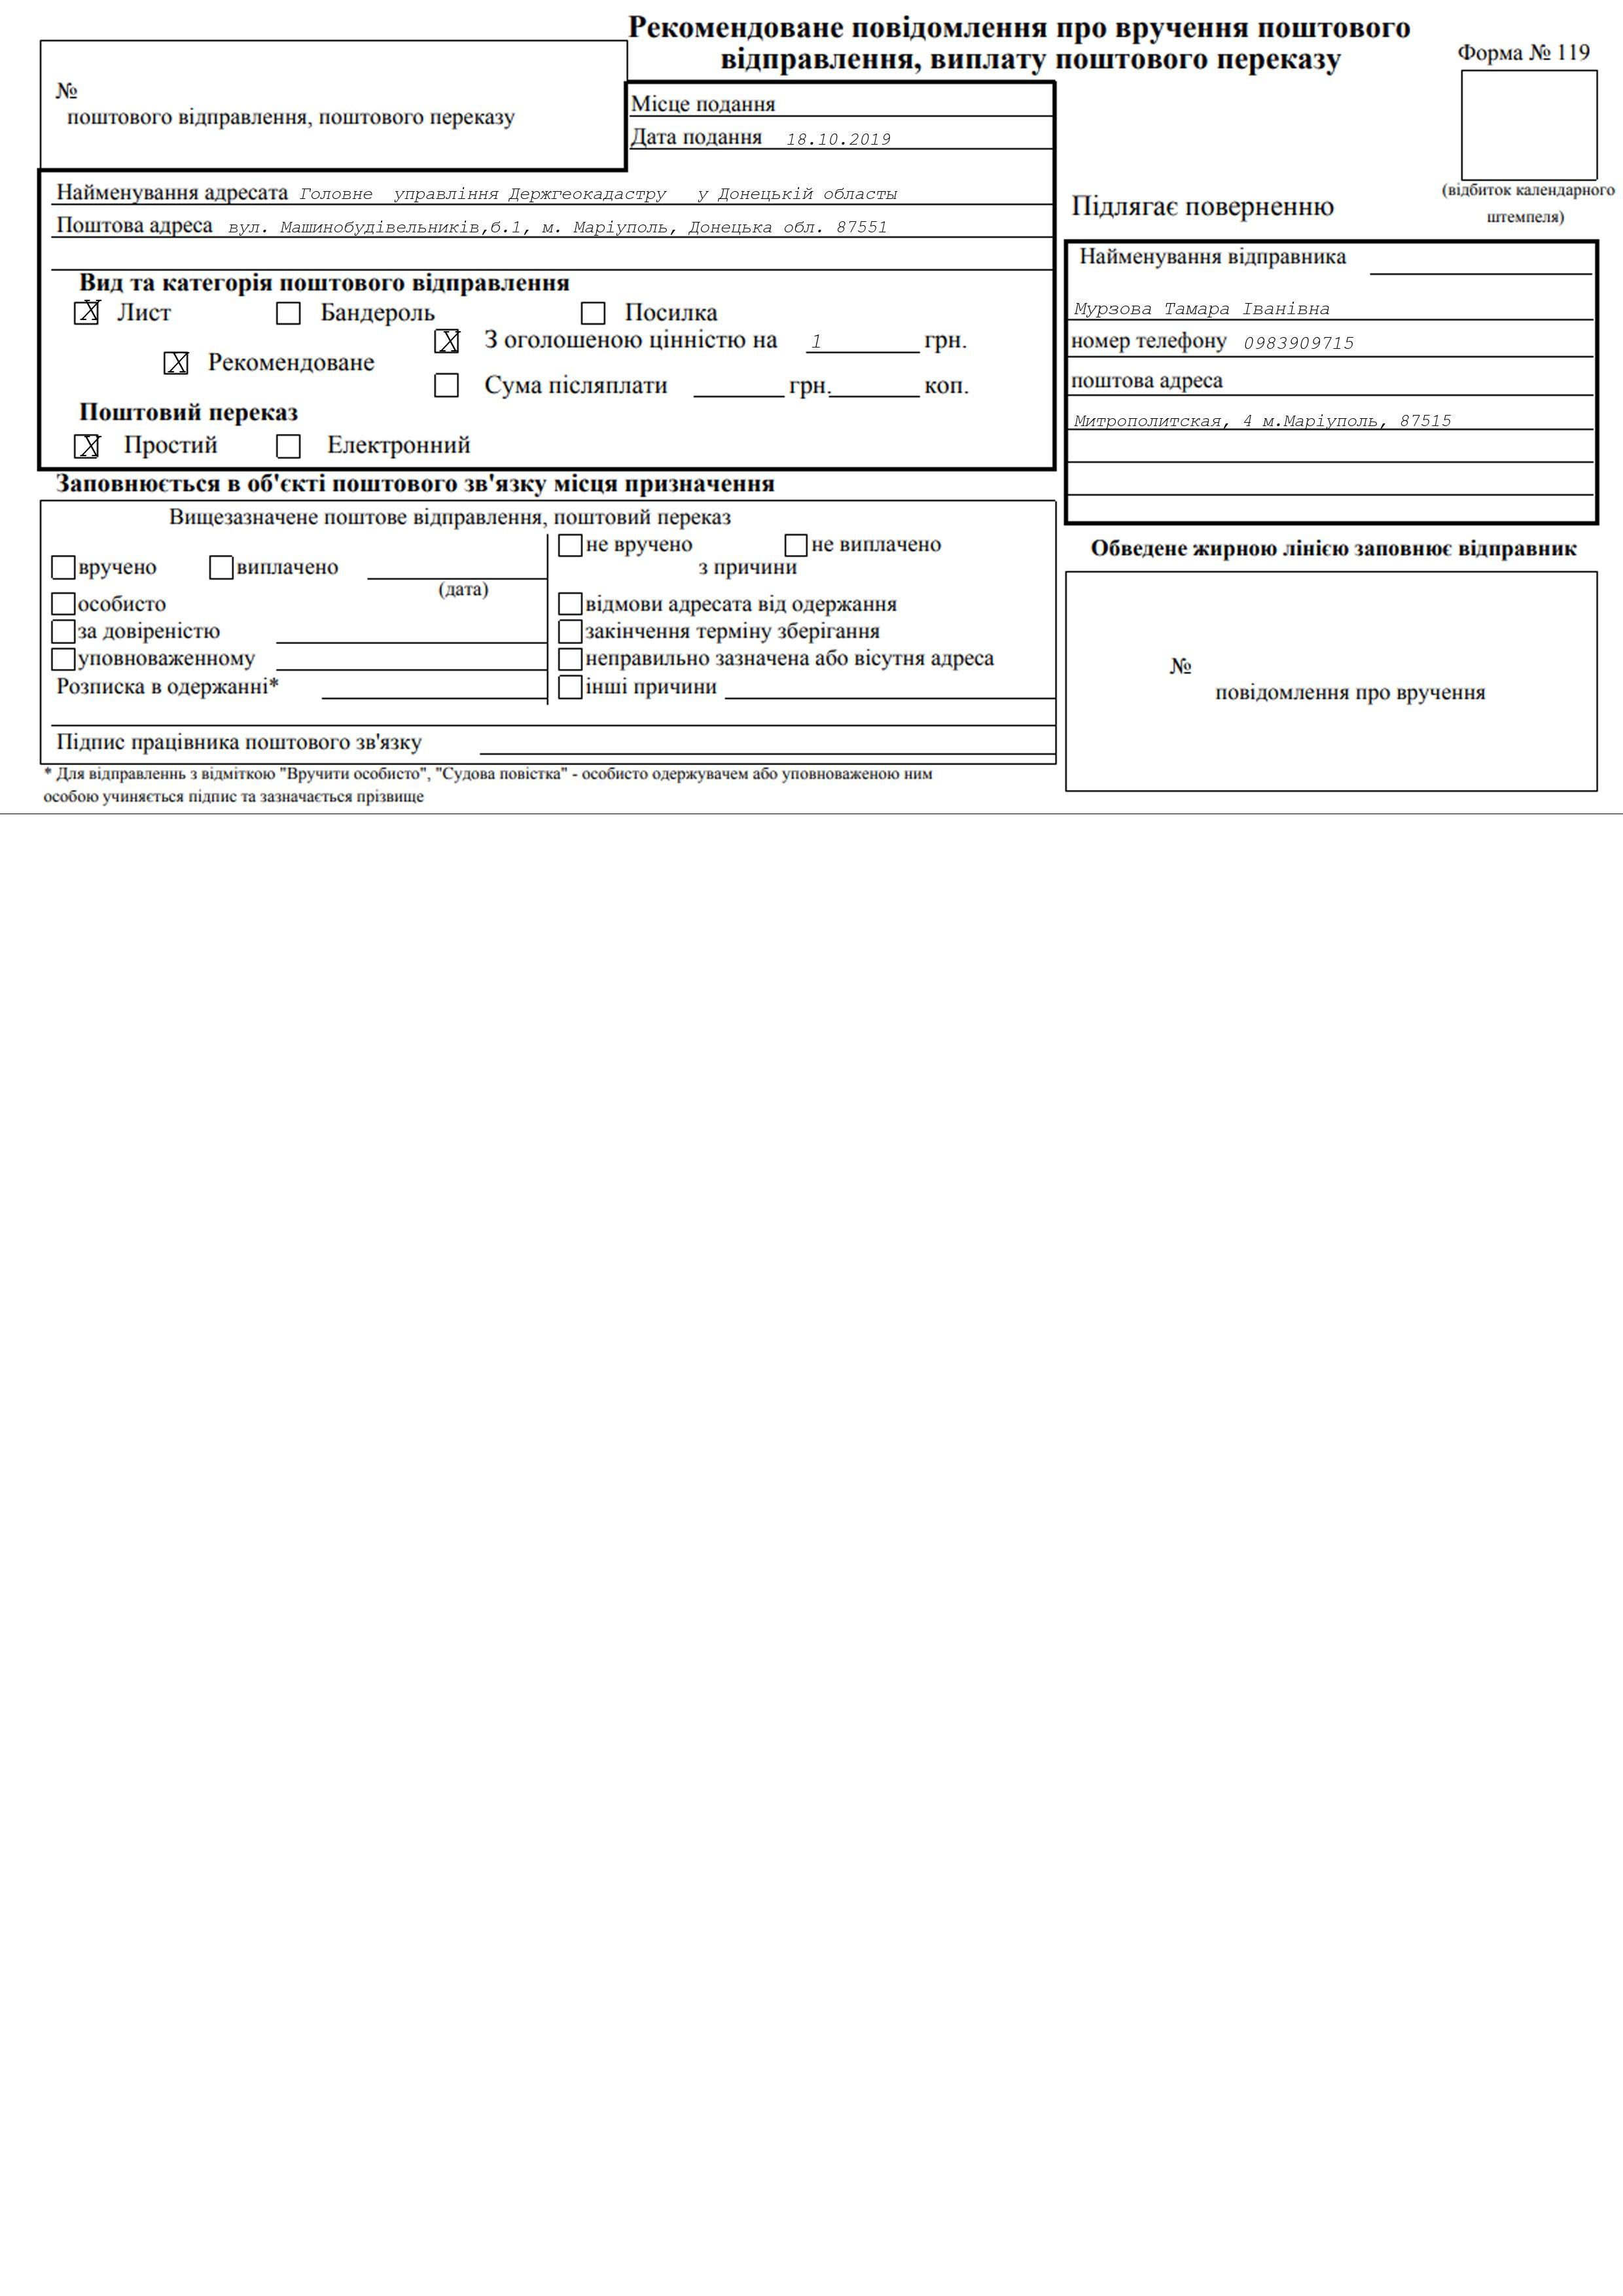 Бланк форма 119 приклад 2